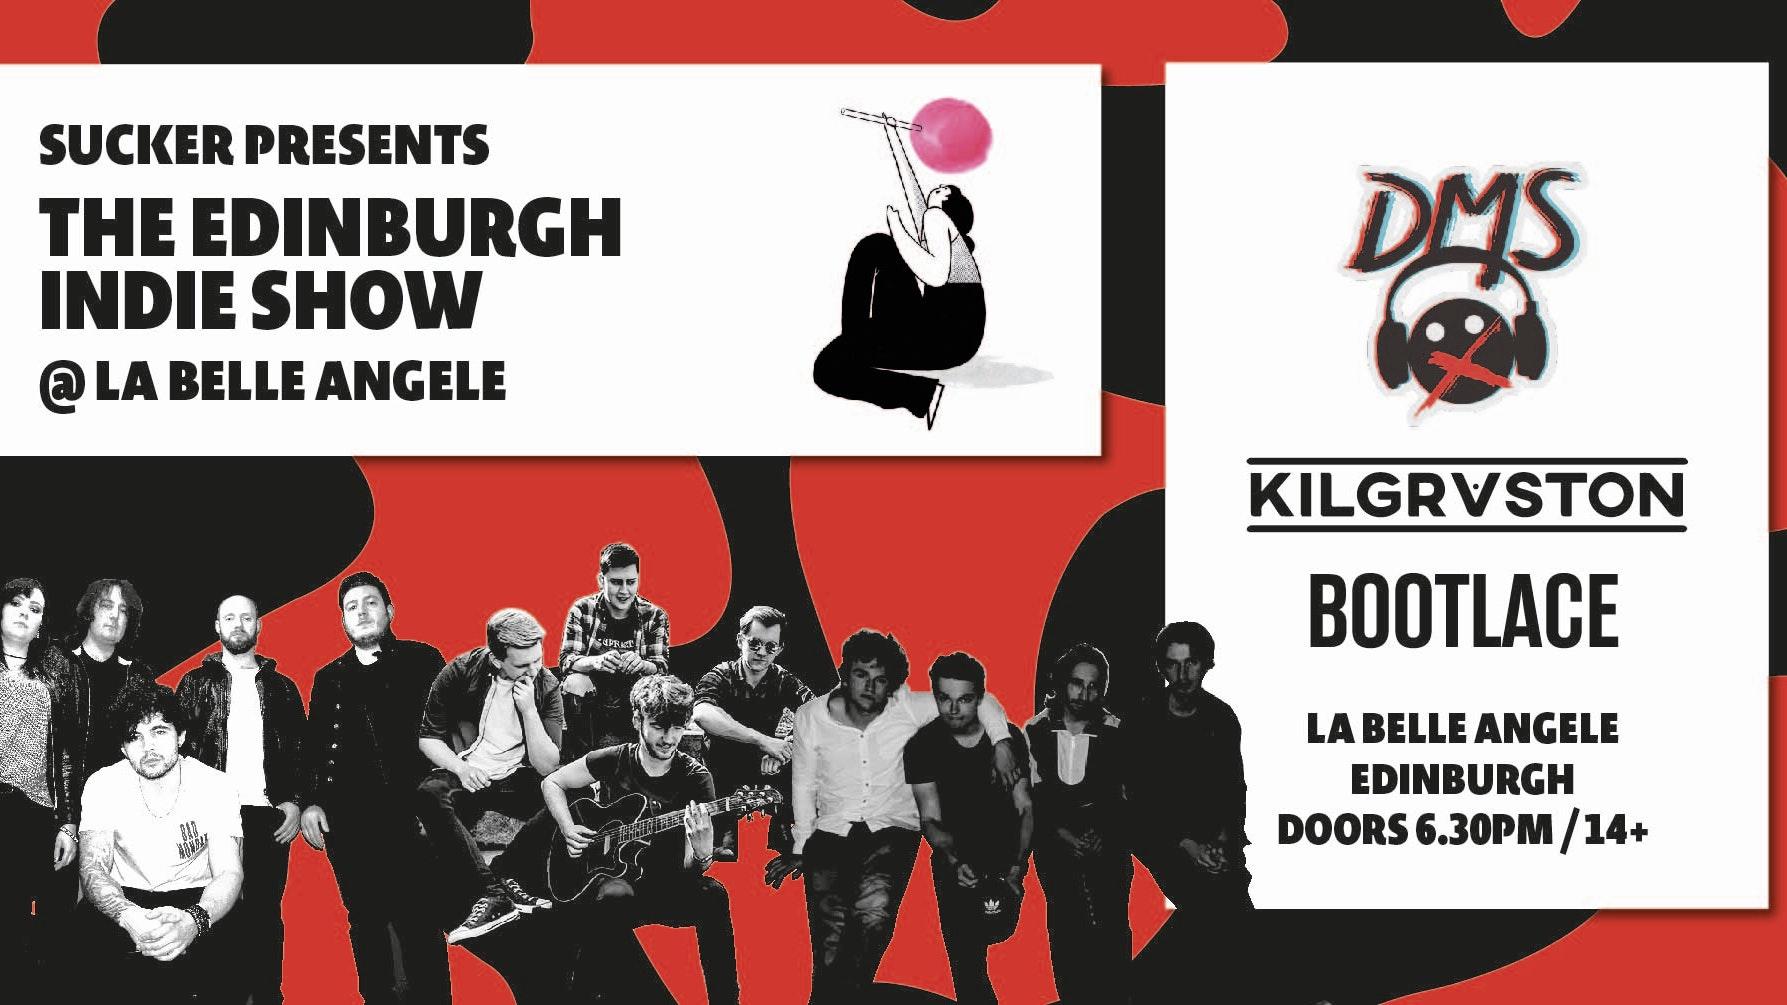 The Edinburgh Indie Show at La Belle Angele